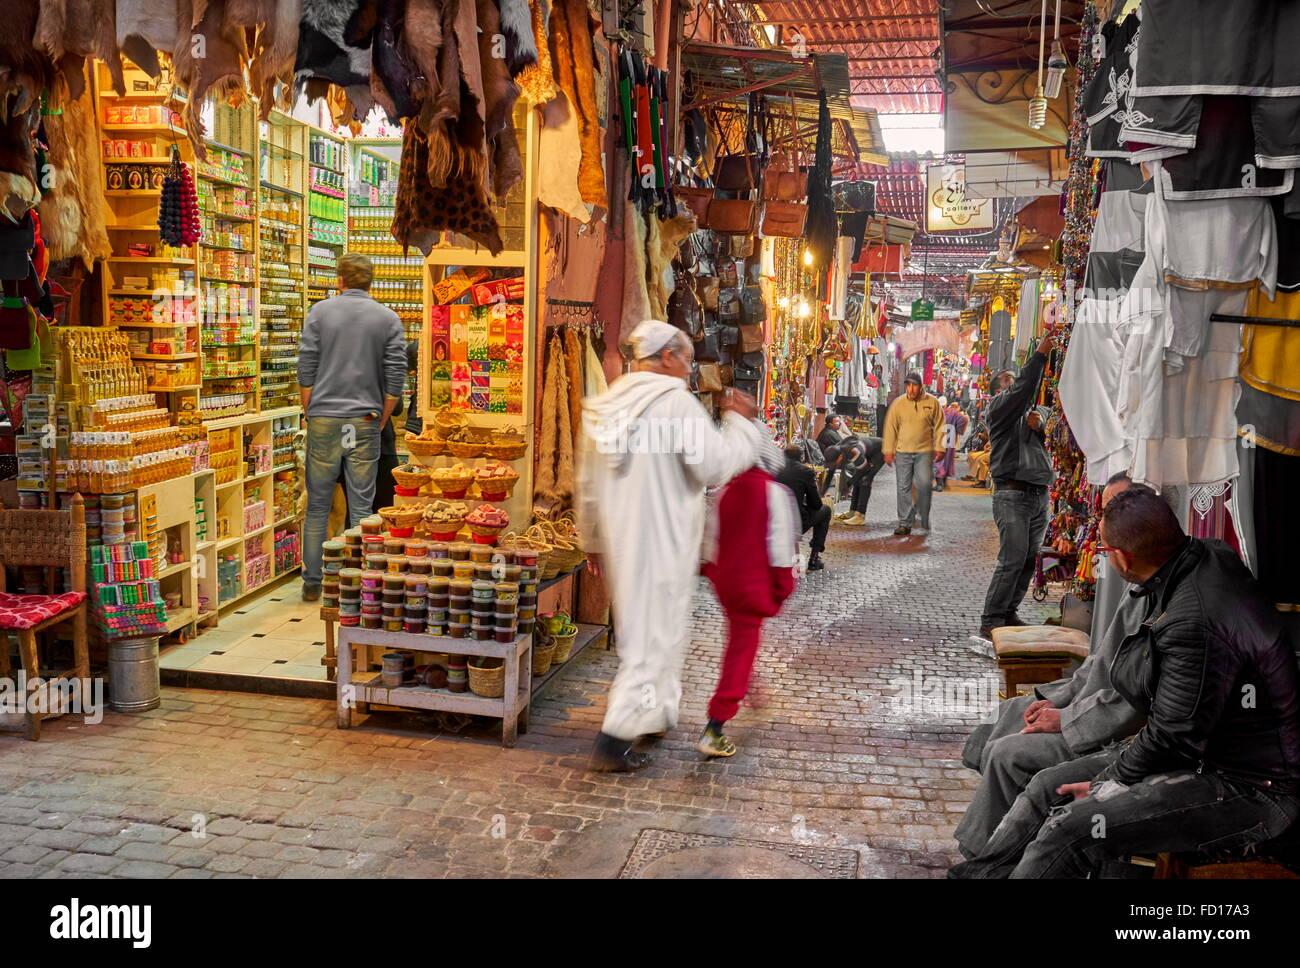 Medina von Marrakesch, lokalen Souk, Marokko, Afrika Stockbild